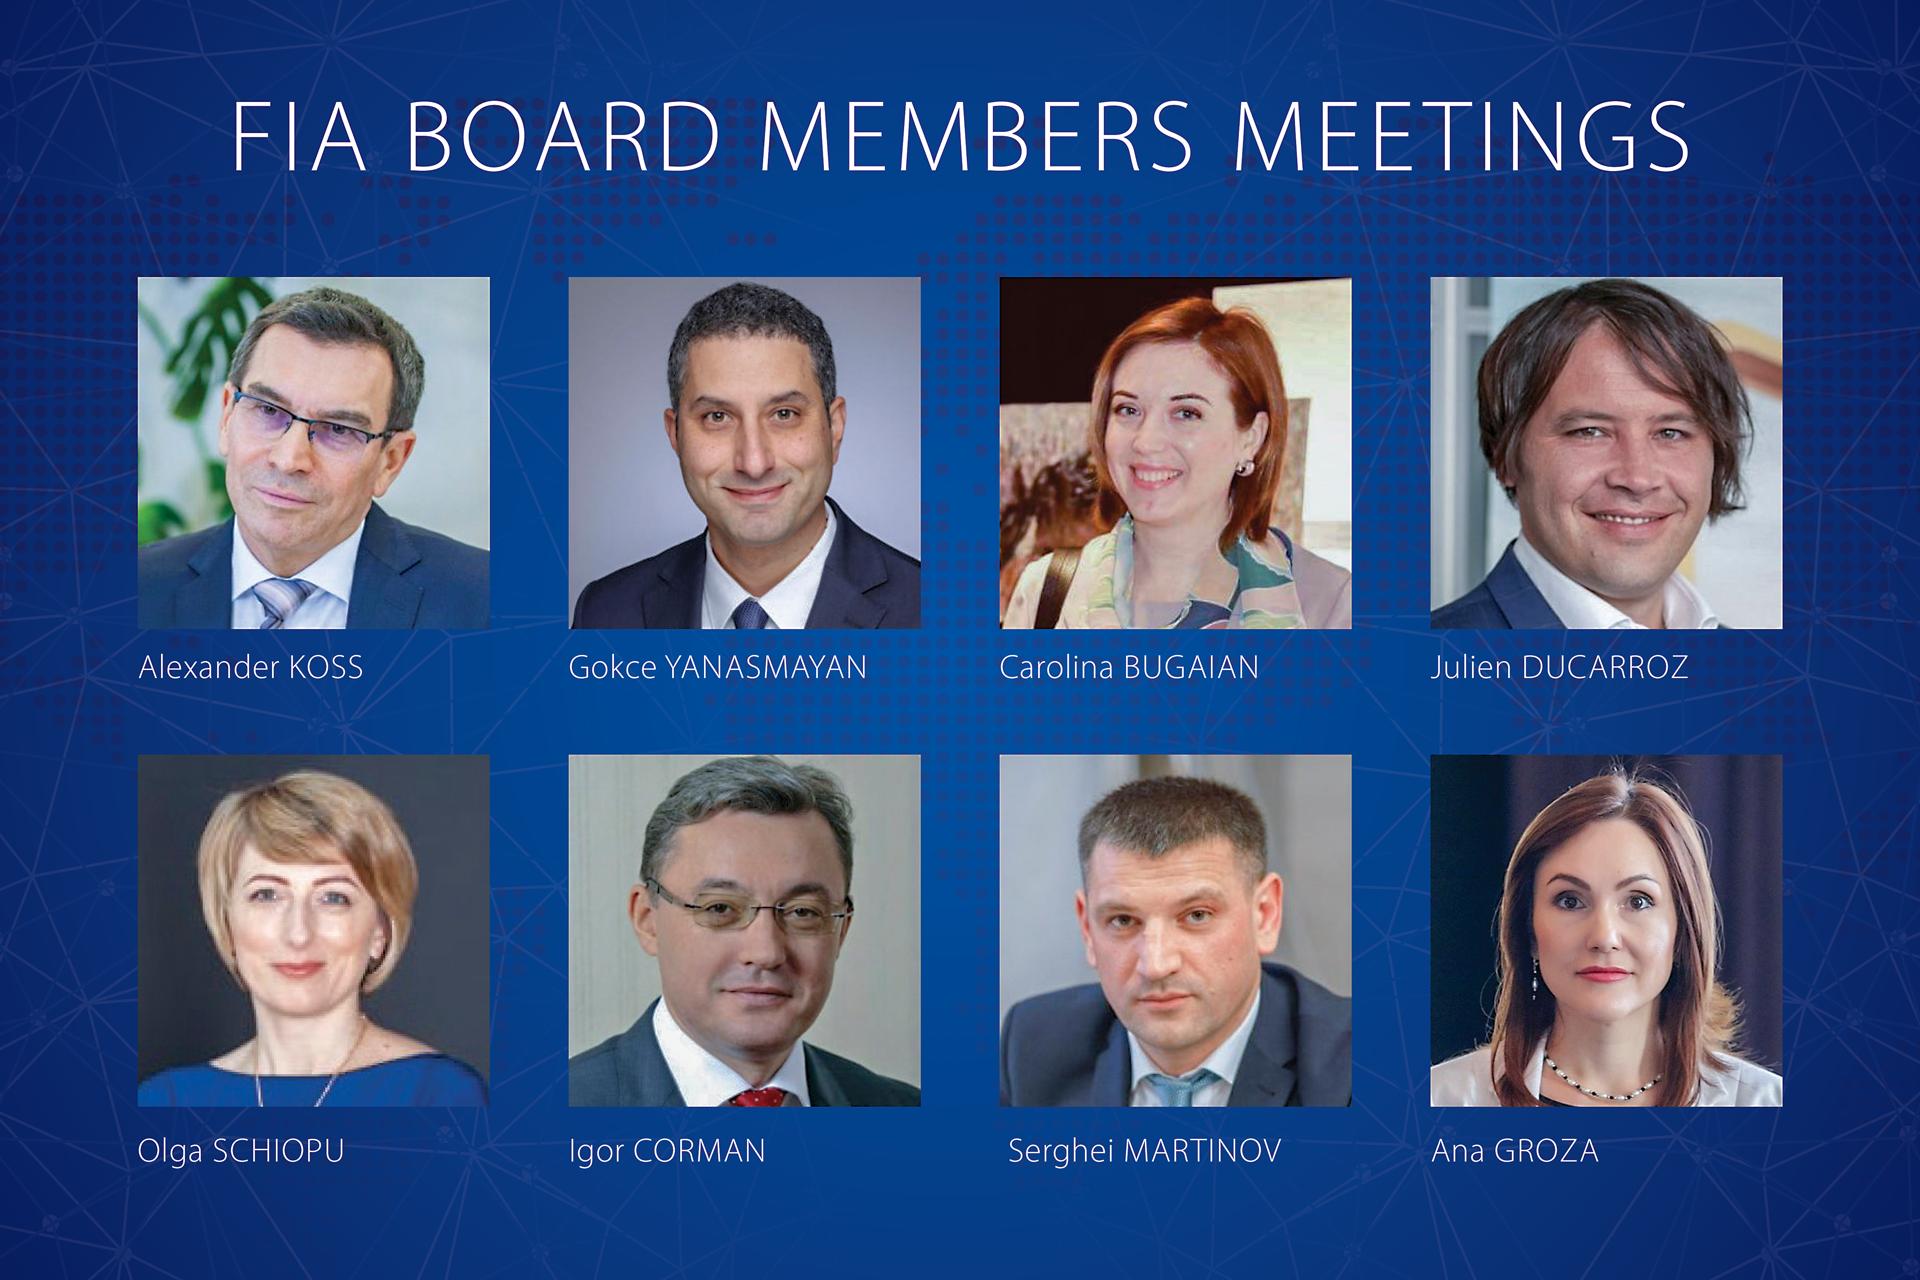 FIA Board Members Meetings